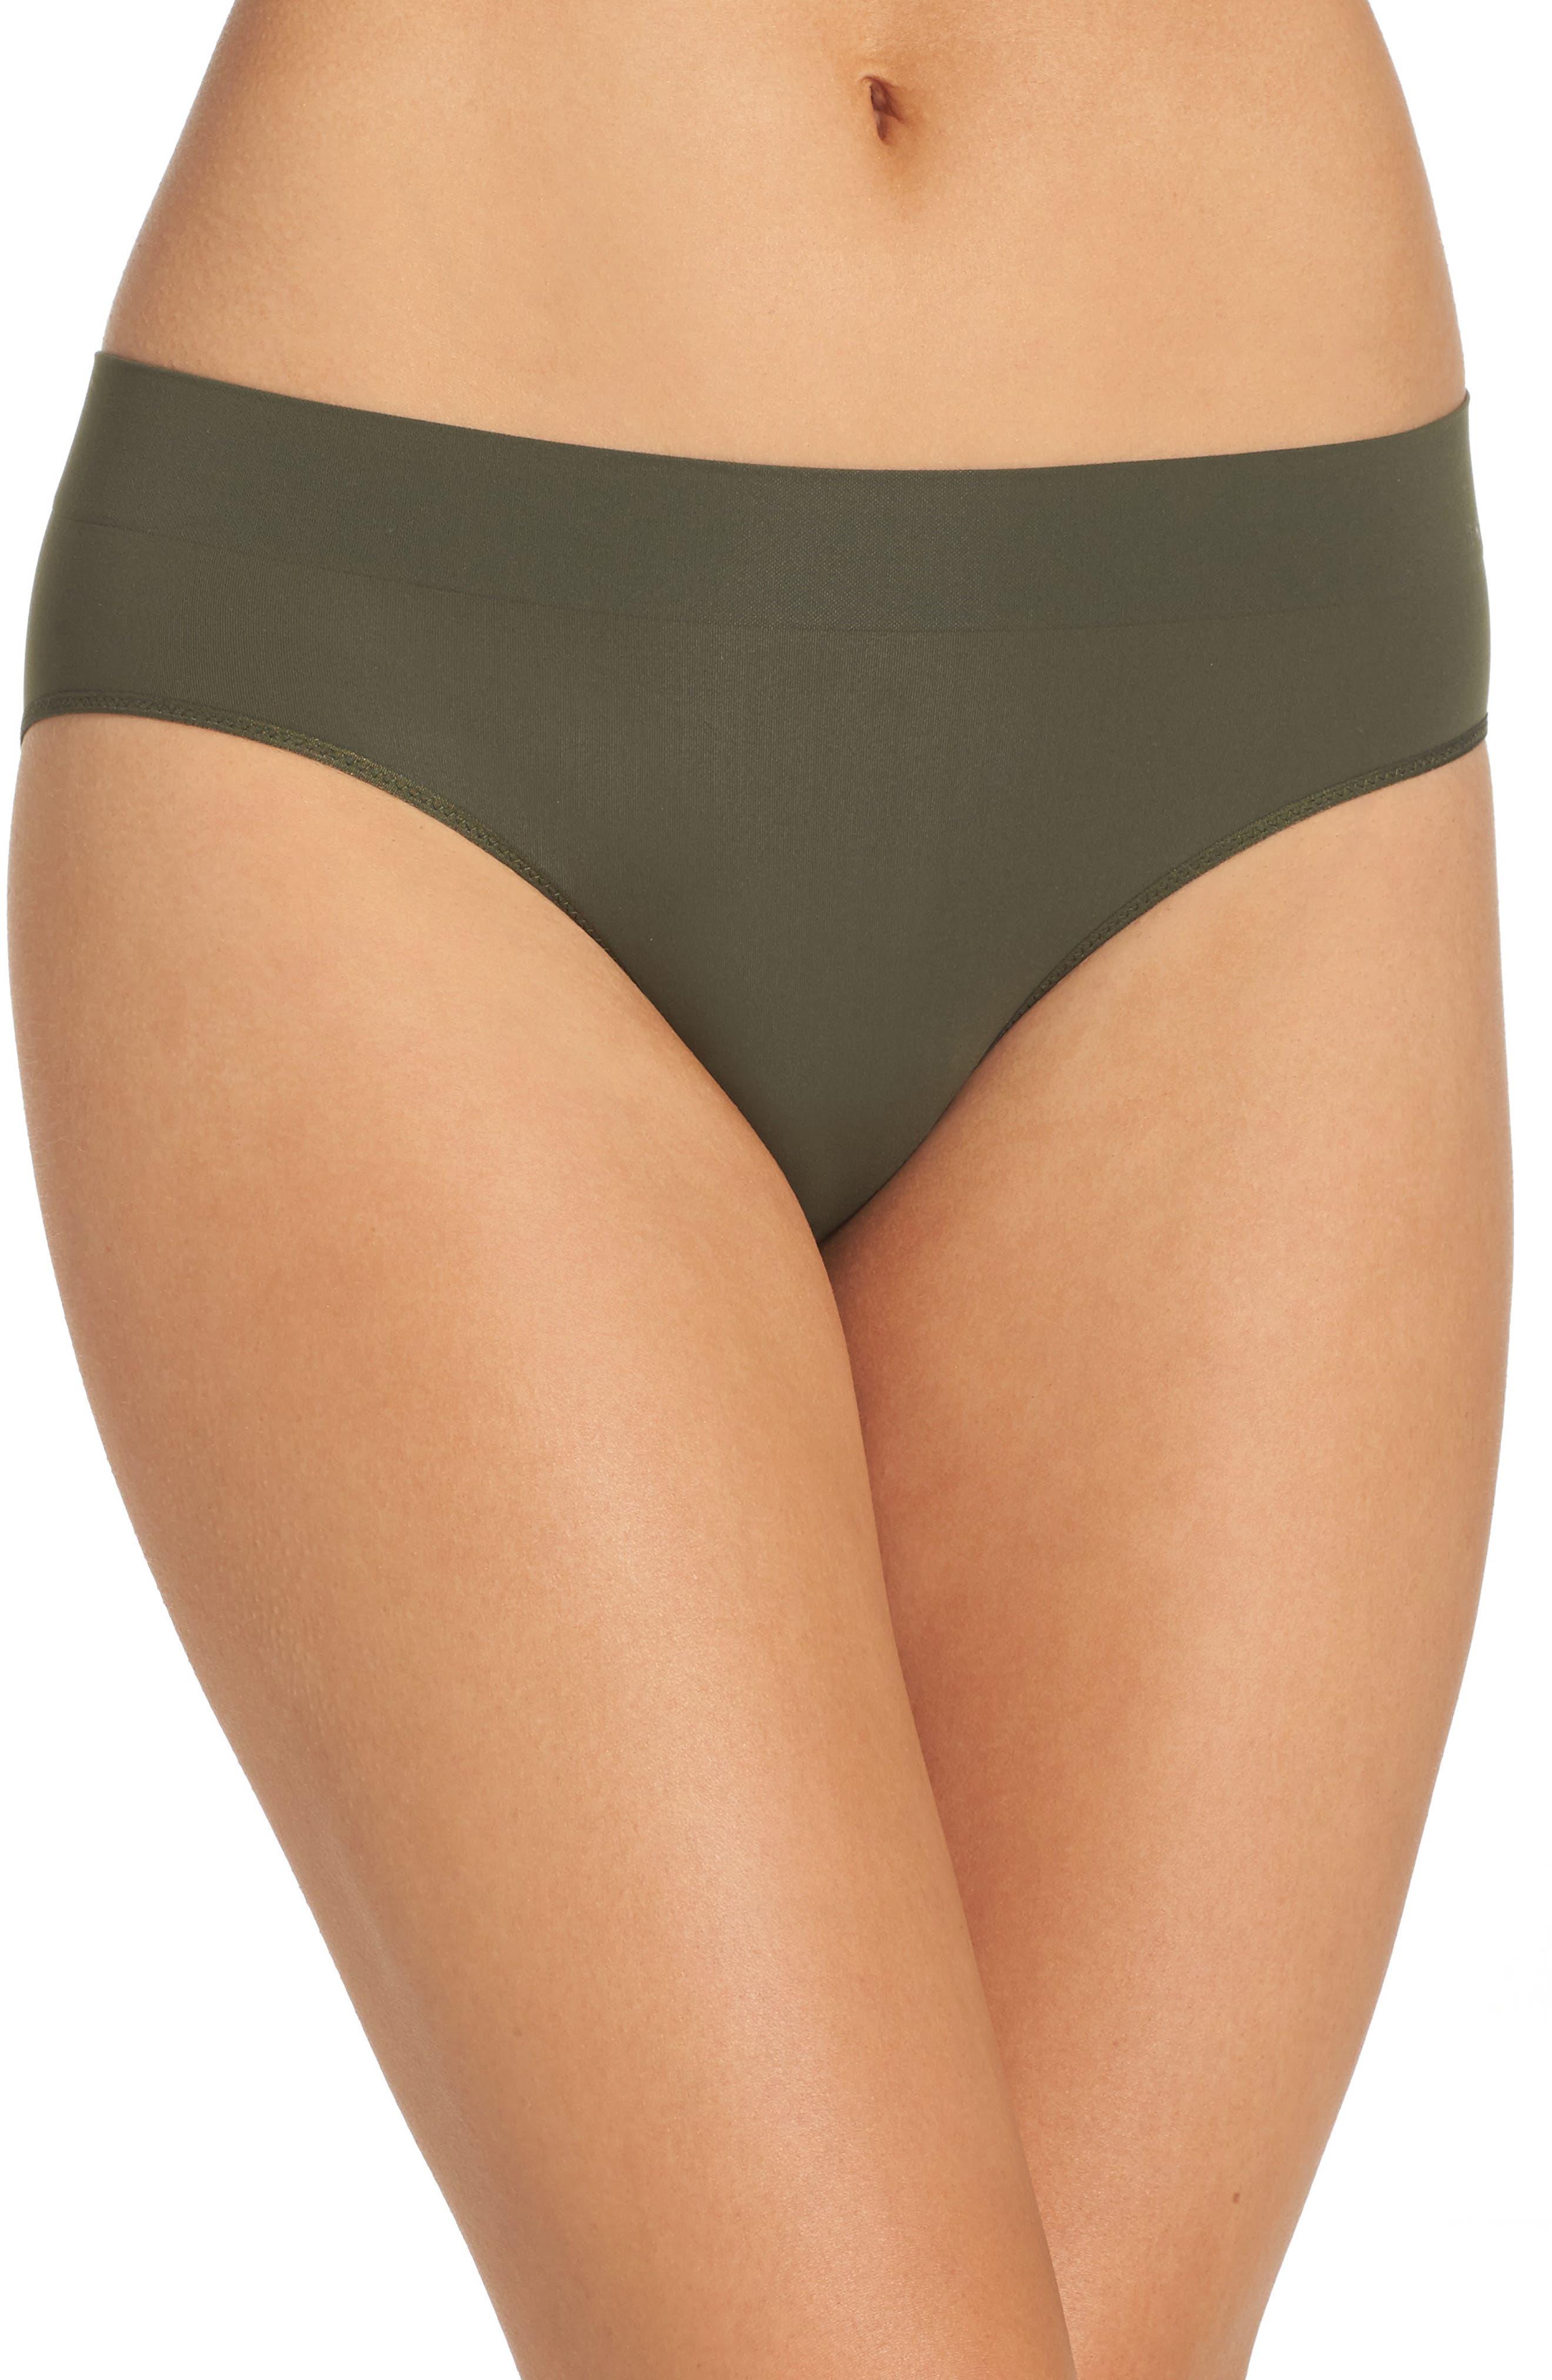 DKNY LiteWear Seamless Bikini (3 for $33)